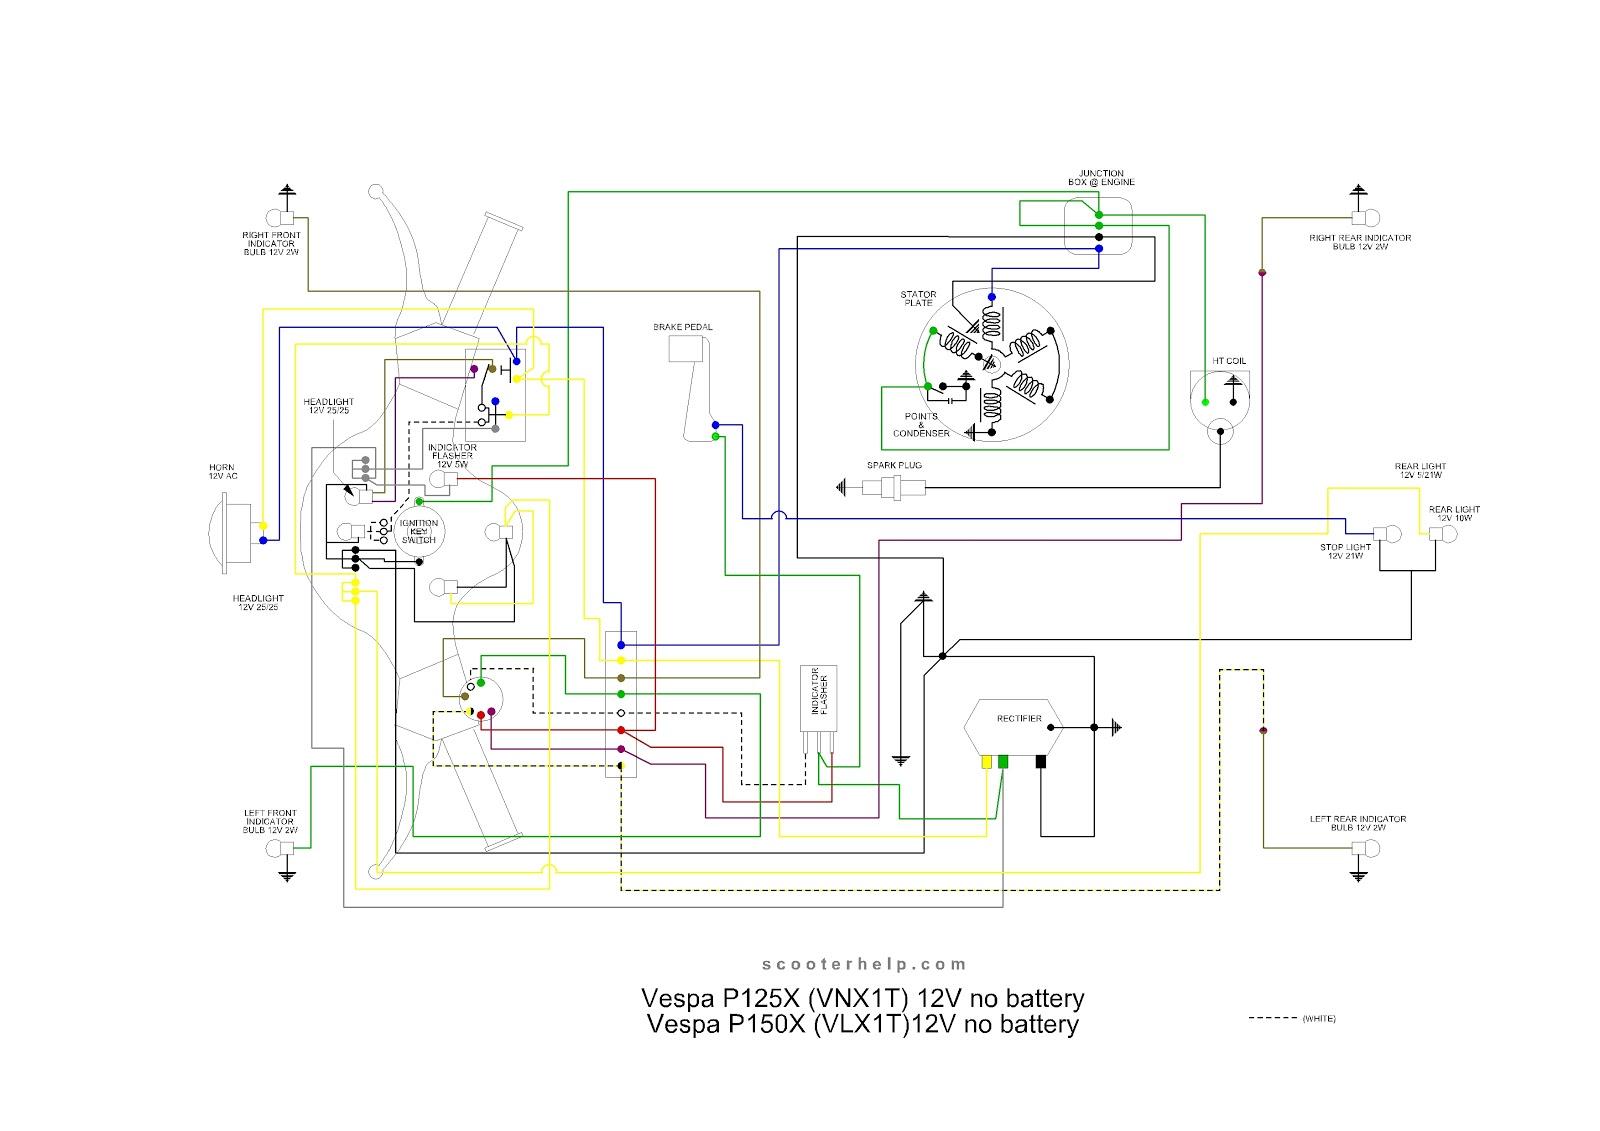 Incredible Wiring Diagram Honda Tiger Revo Wiring Diagram Wiring 101 Capemaxxcnl